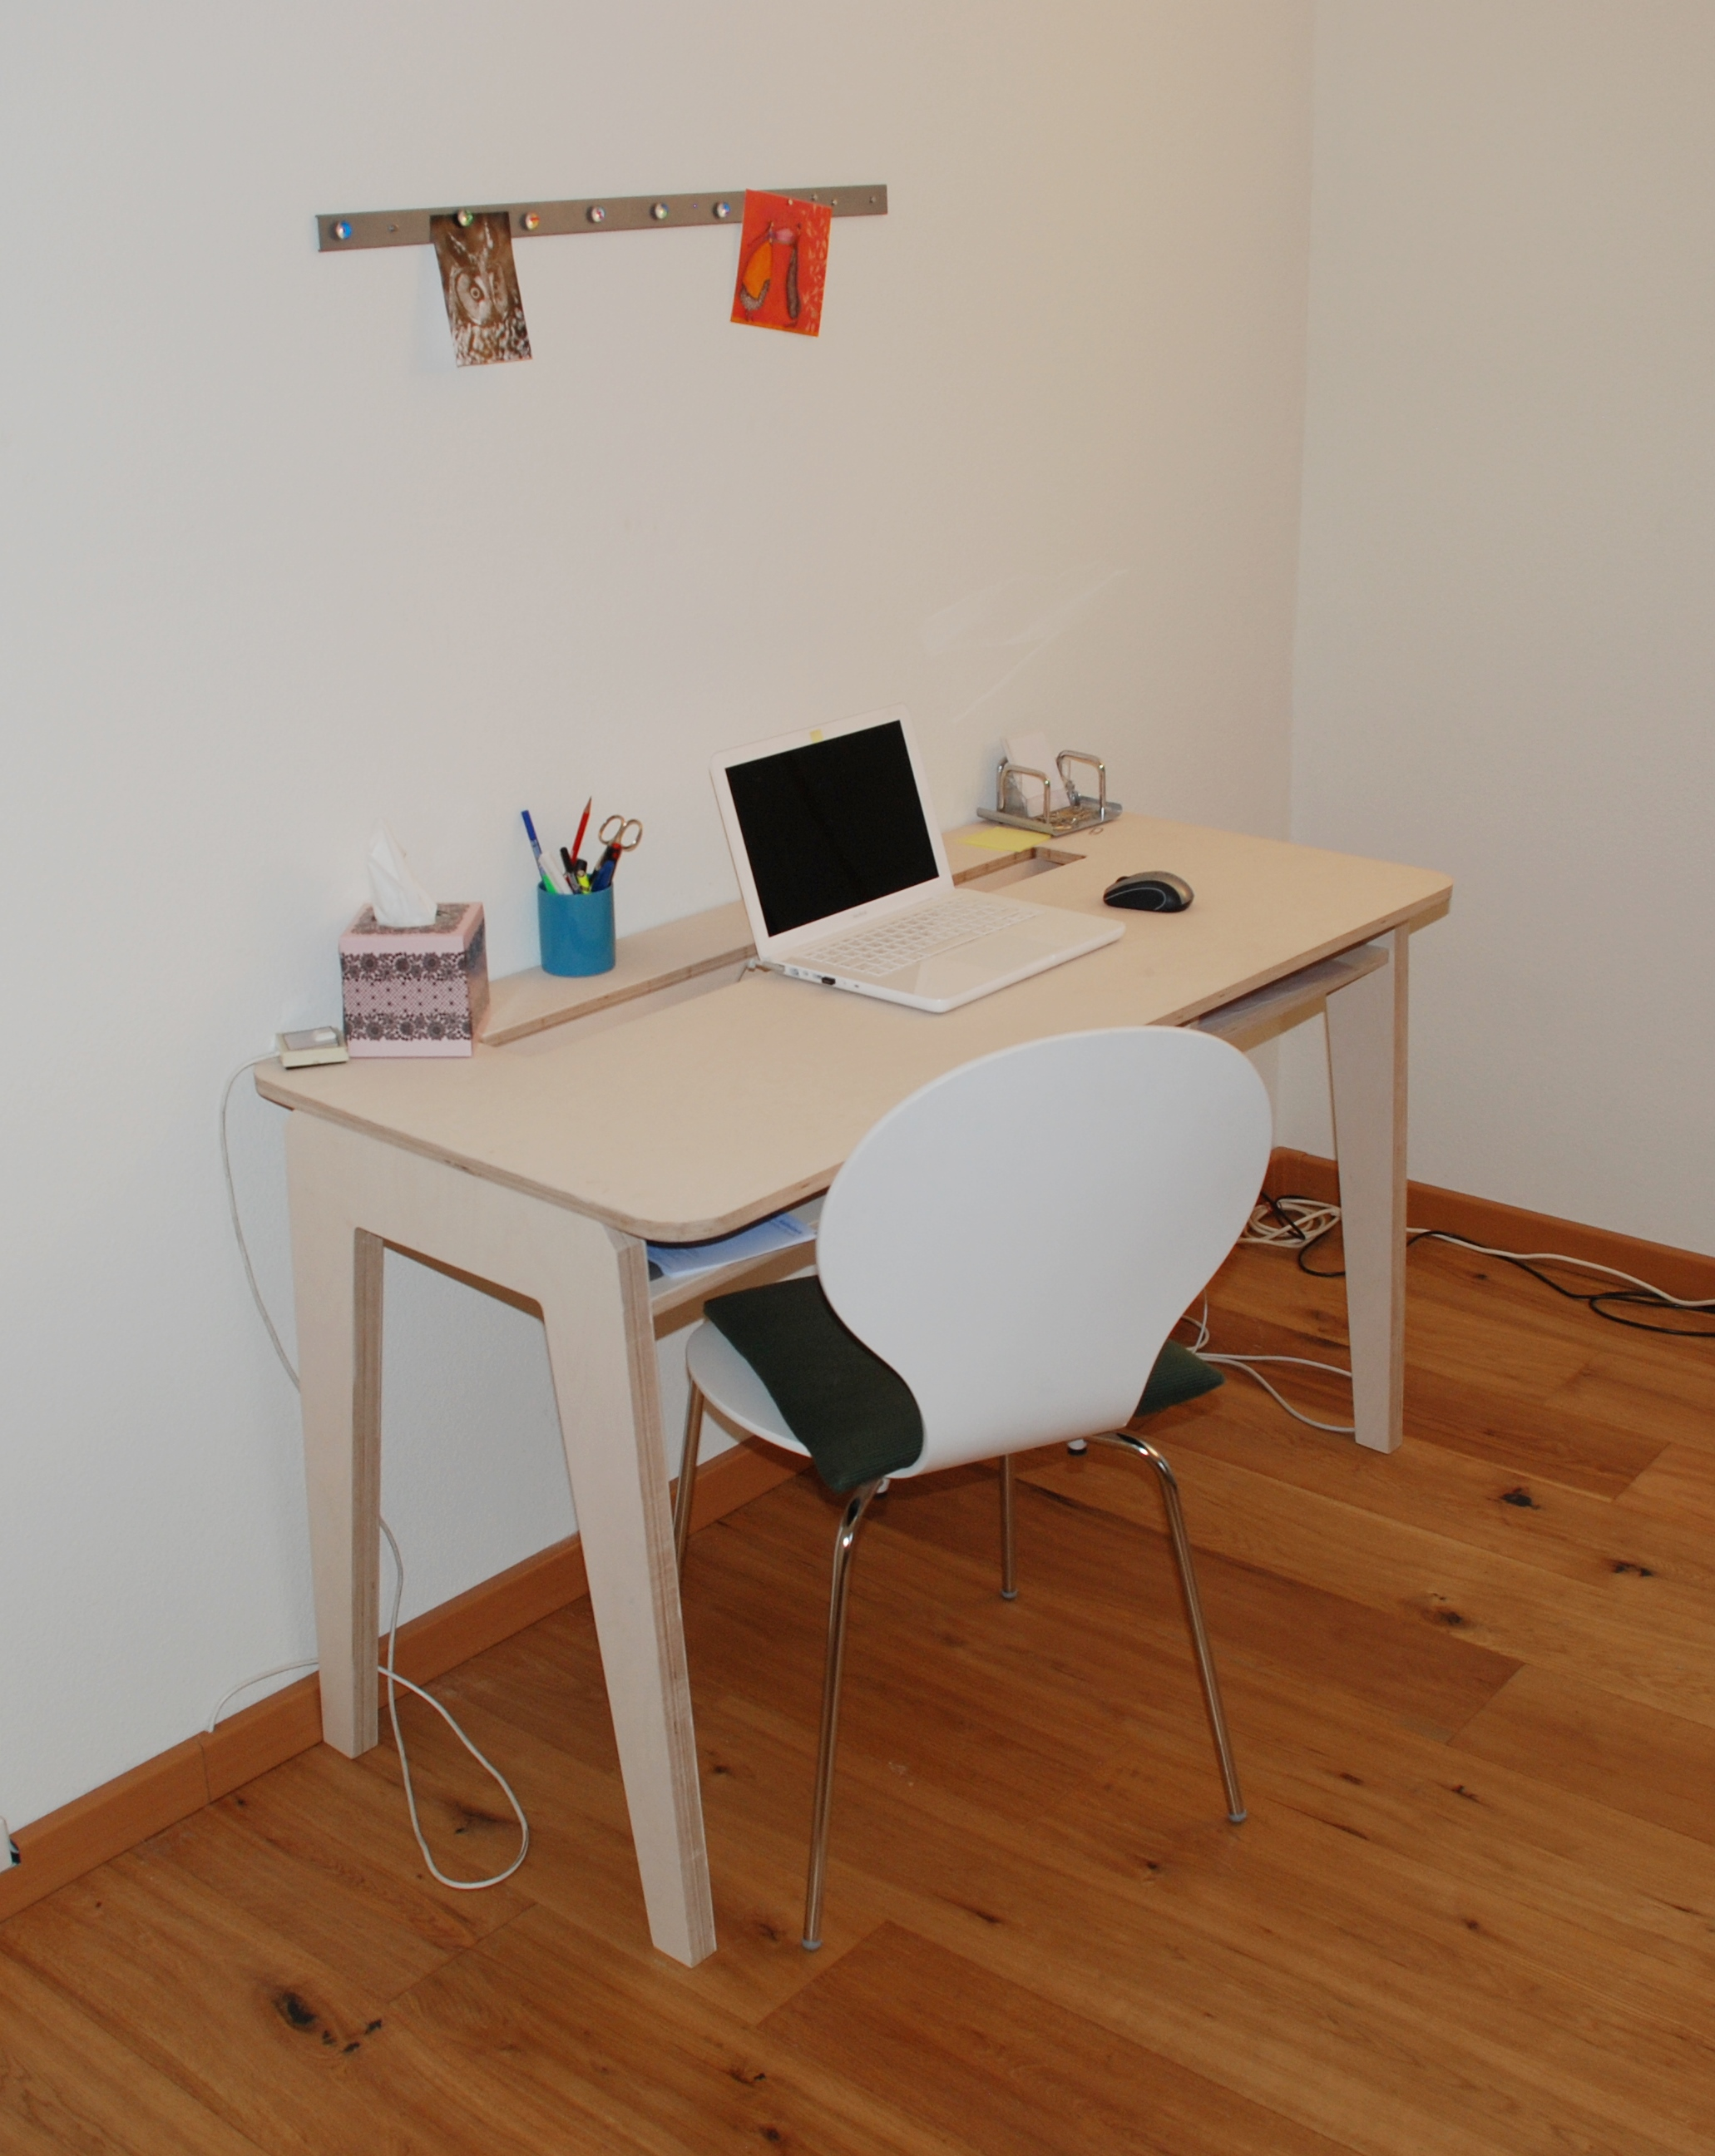 pult birkensperrholz lasiert schreinerei stephan k lin. Black Bedroom Furniture Sets. Home Design Ideas